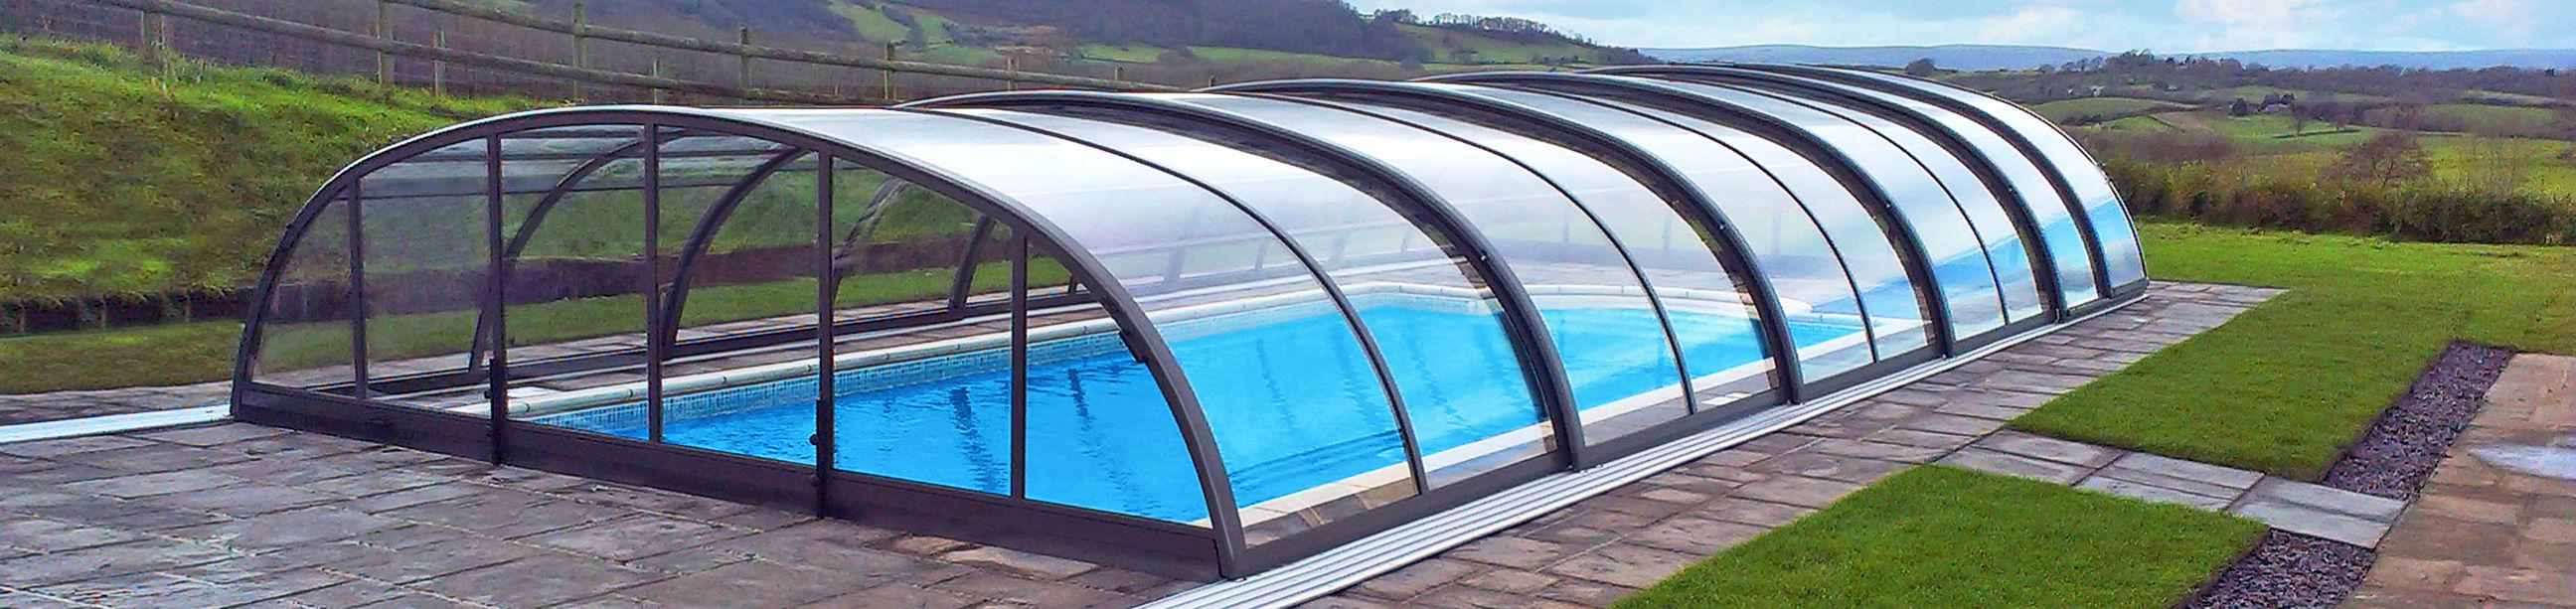 Do it yourself pool enclosures solutioingenieria Gallery